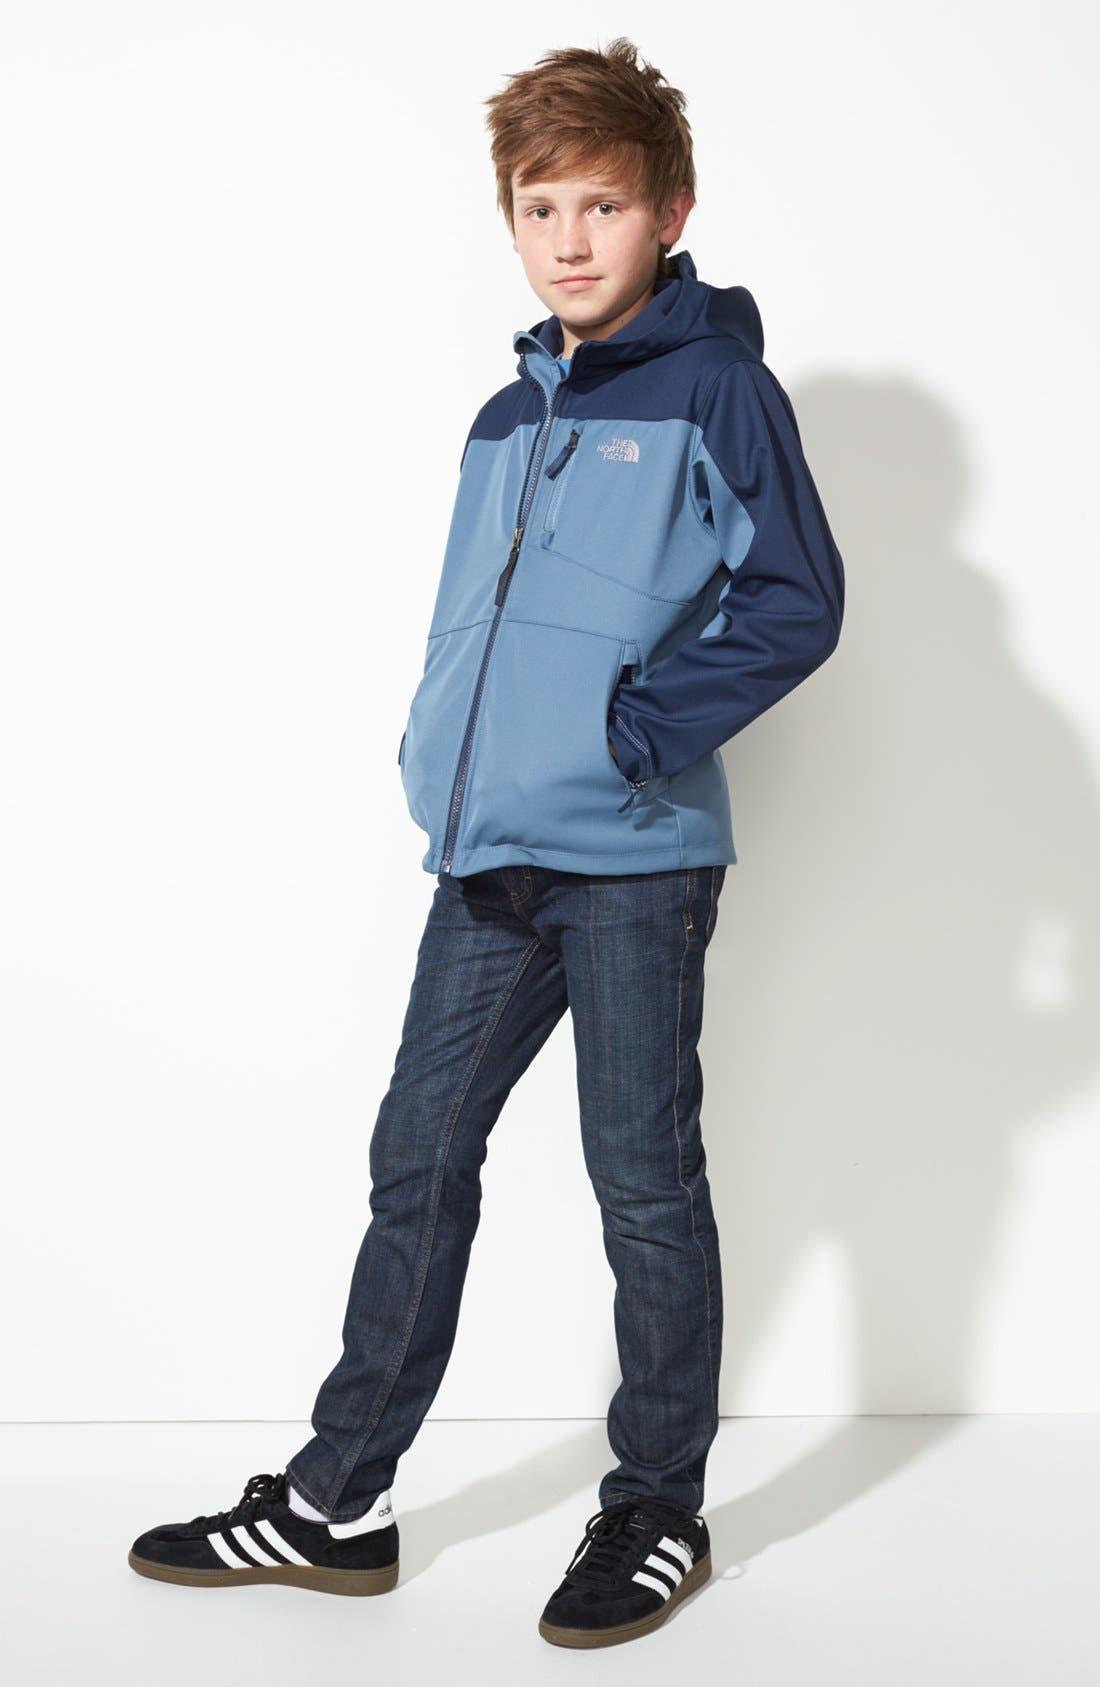 Alternate Image 1 Selected - The North Face Jacket & Joe's Jeans (Big Boys)